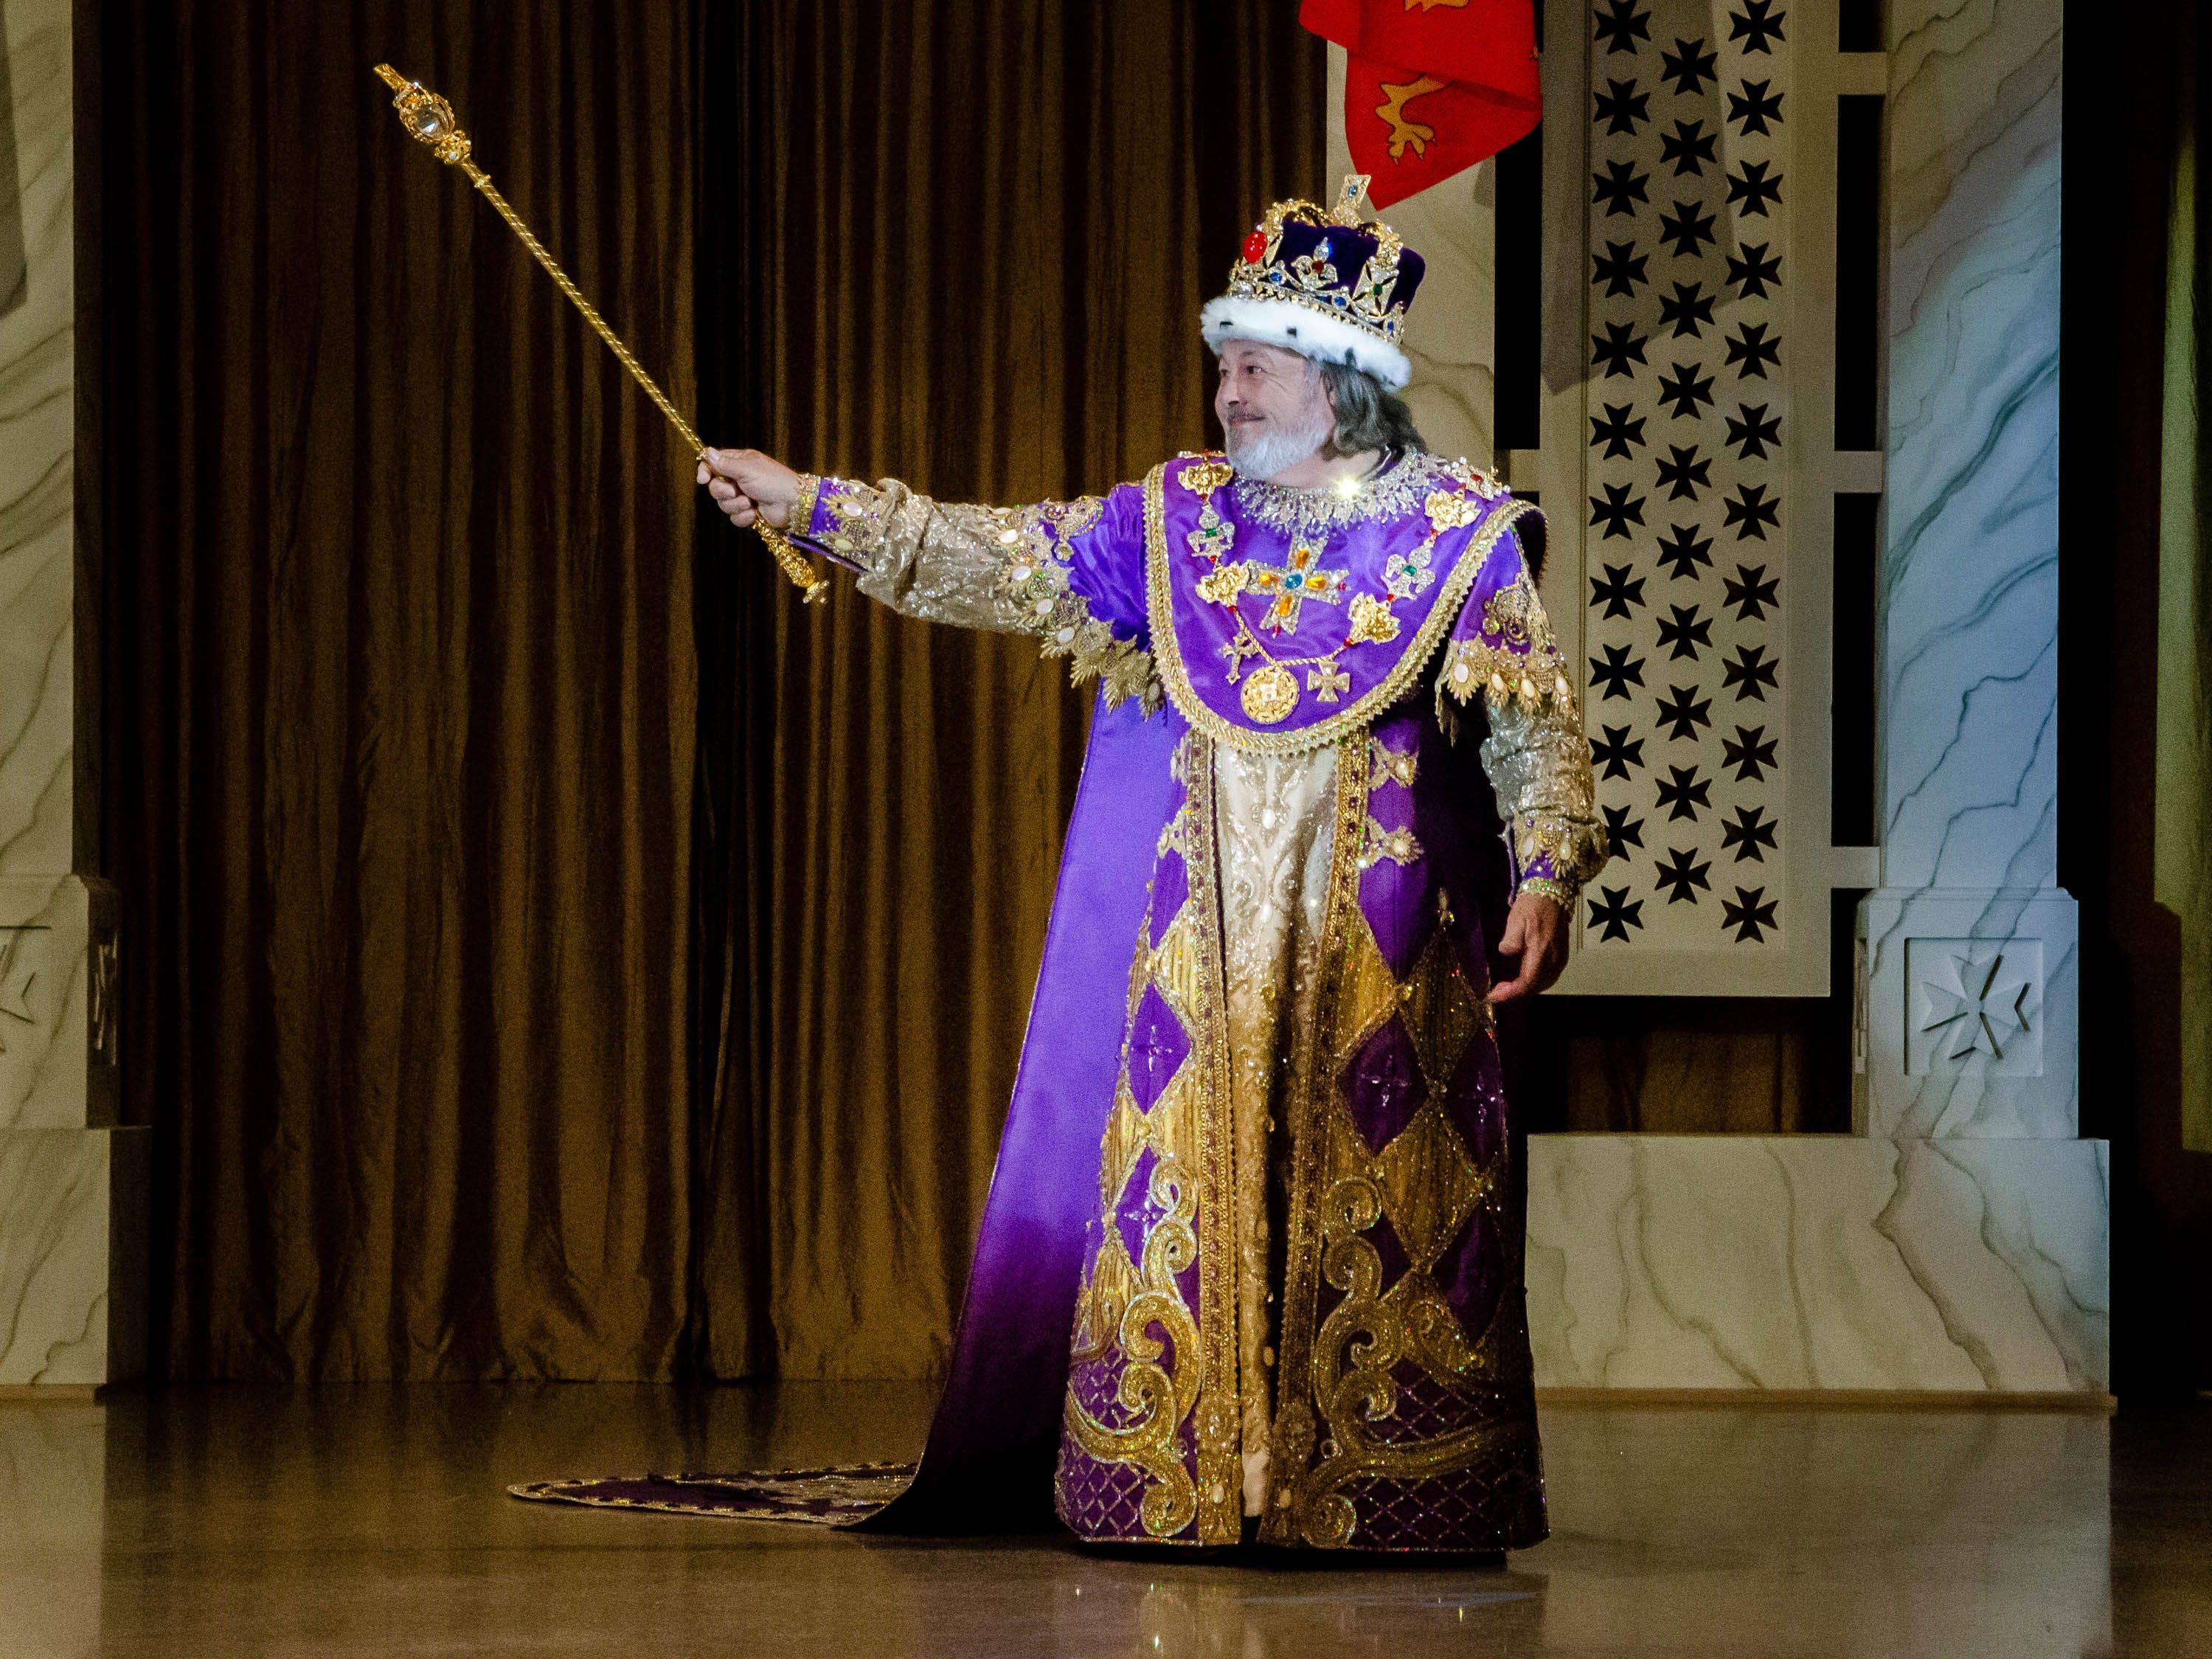 77th Annual Krew de Troubadours Mardi Gras Ball. King Richard Coeur de Lion makes his first apperance of the night.